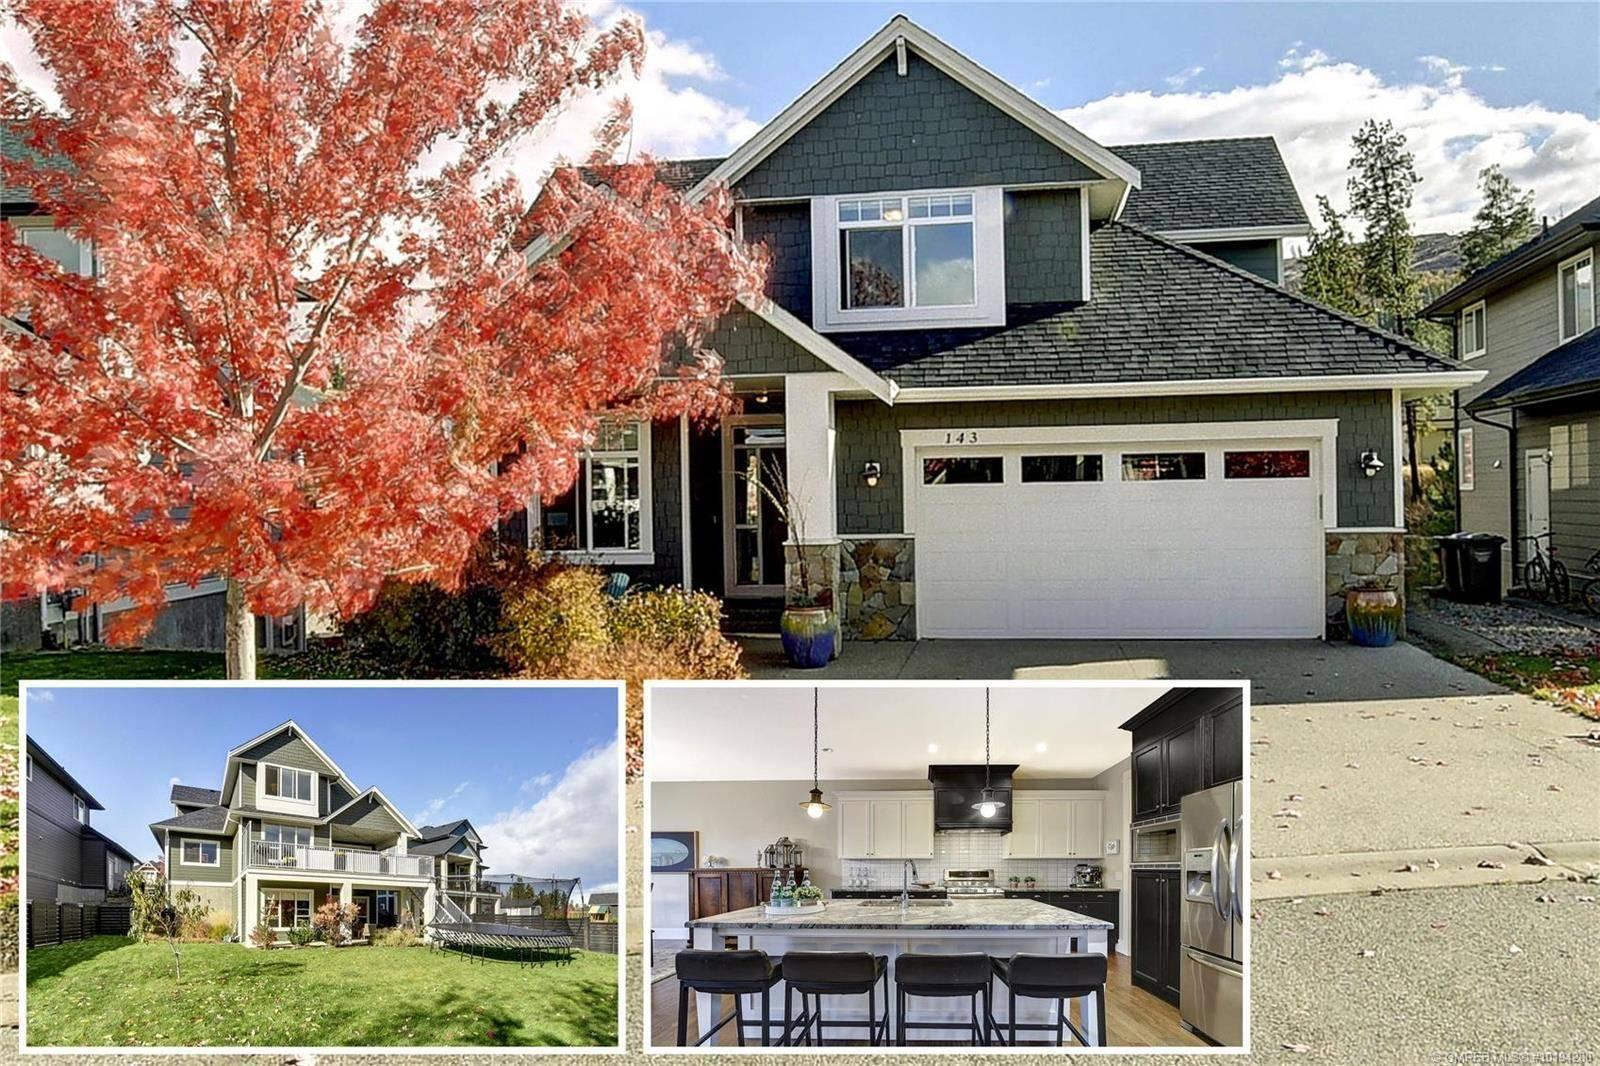 House for sale at 515 Wren Pl Unit 143 Kelowna British Columbia - MLS: 10194280